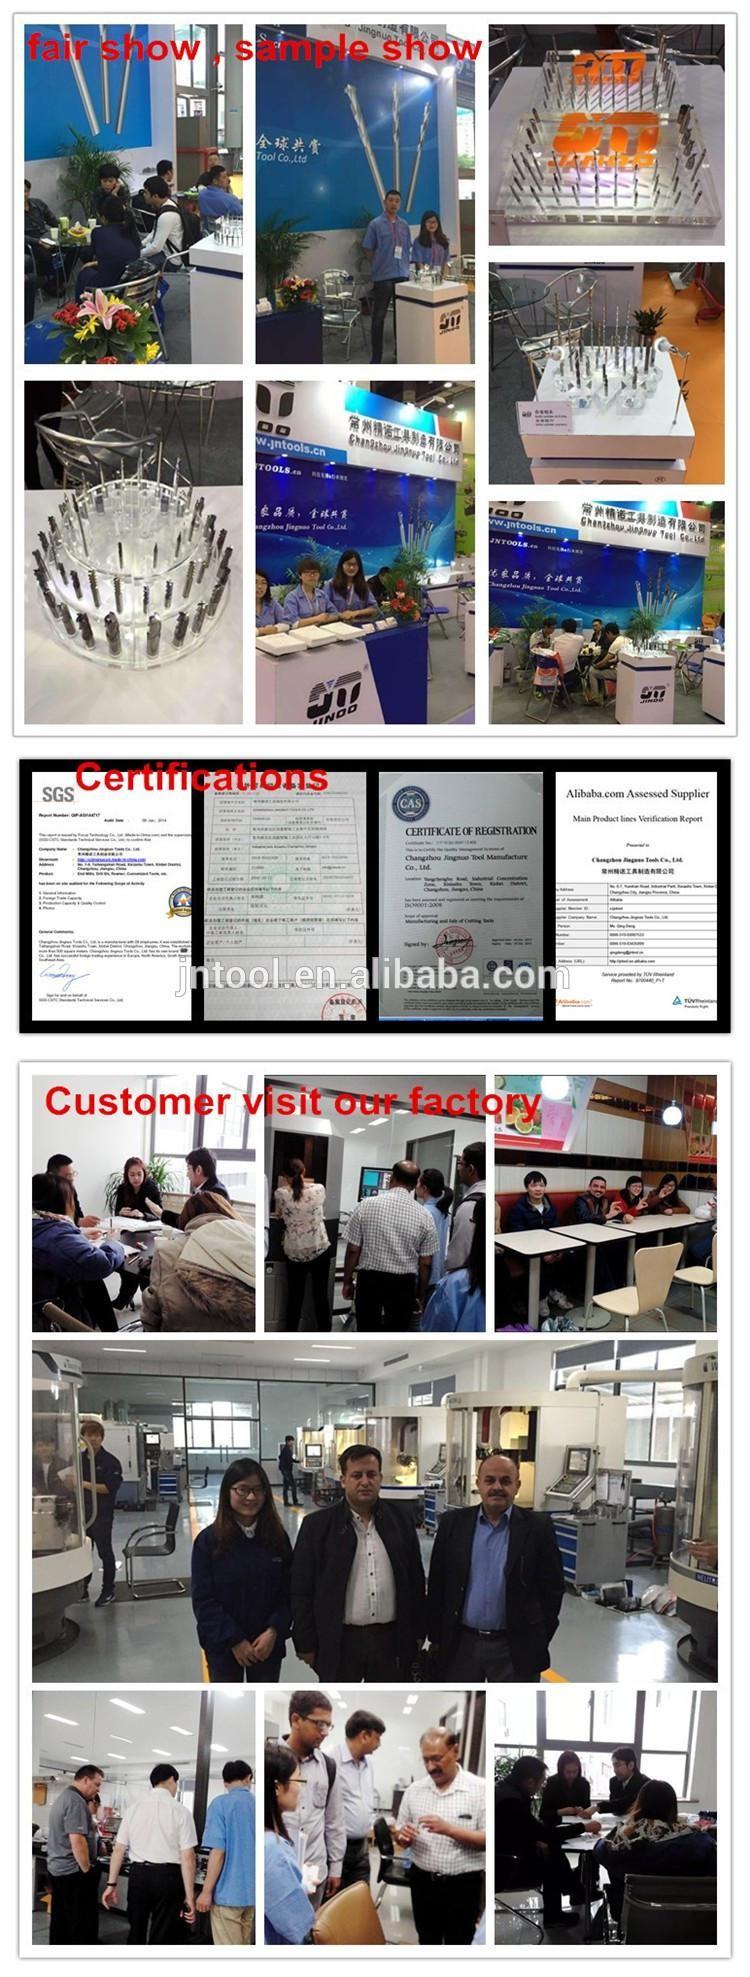 jinoo company information-2